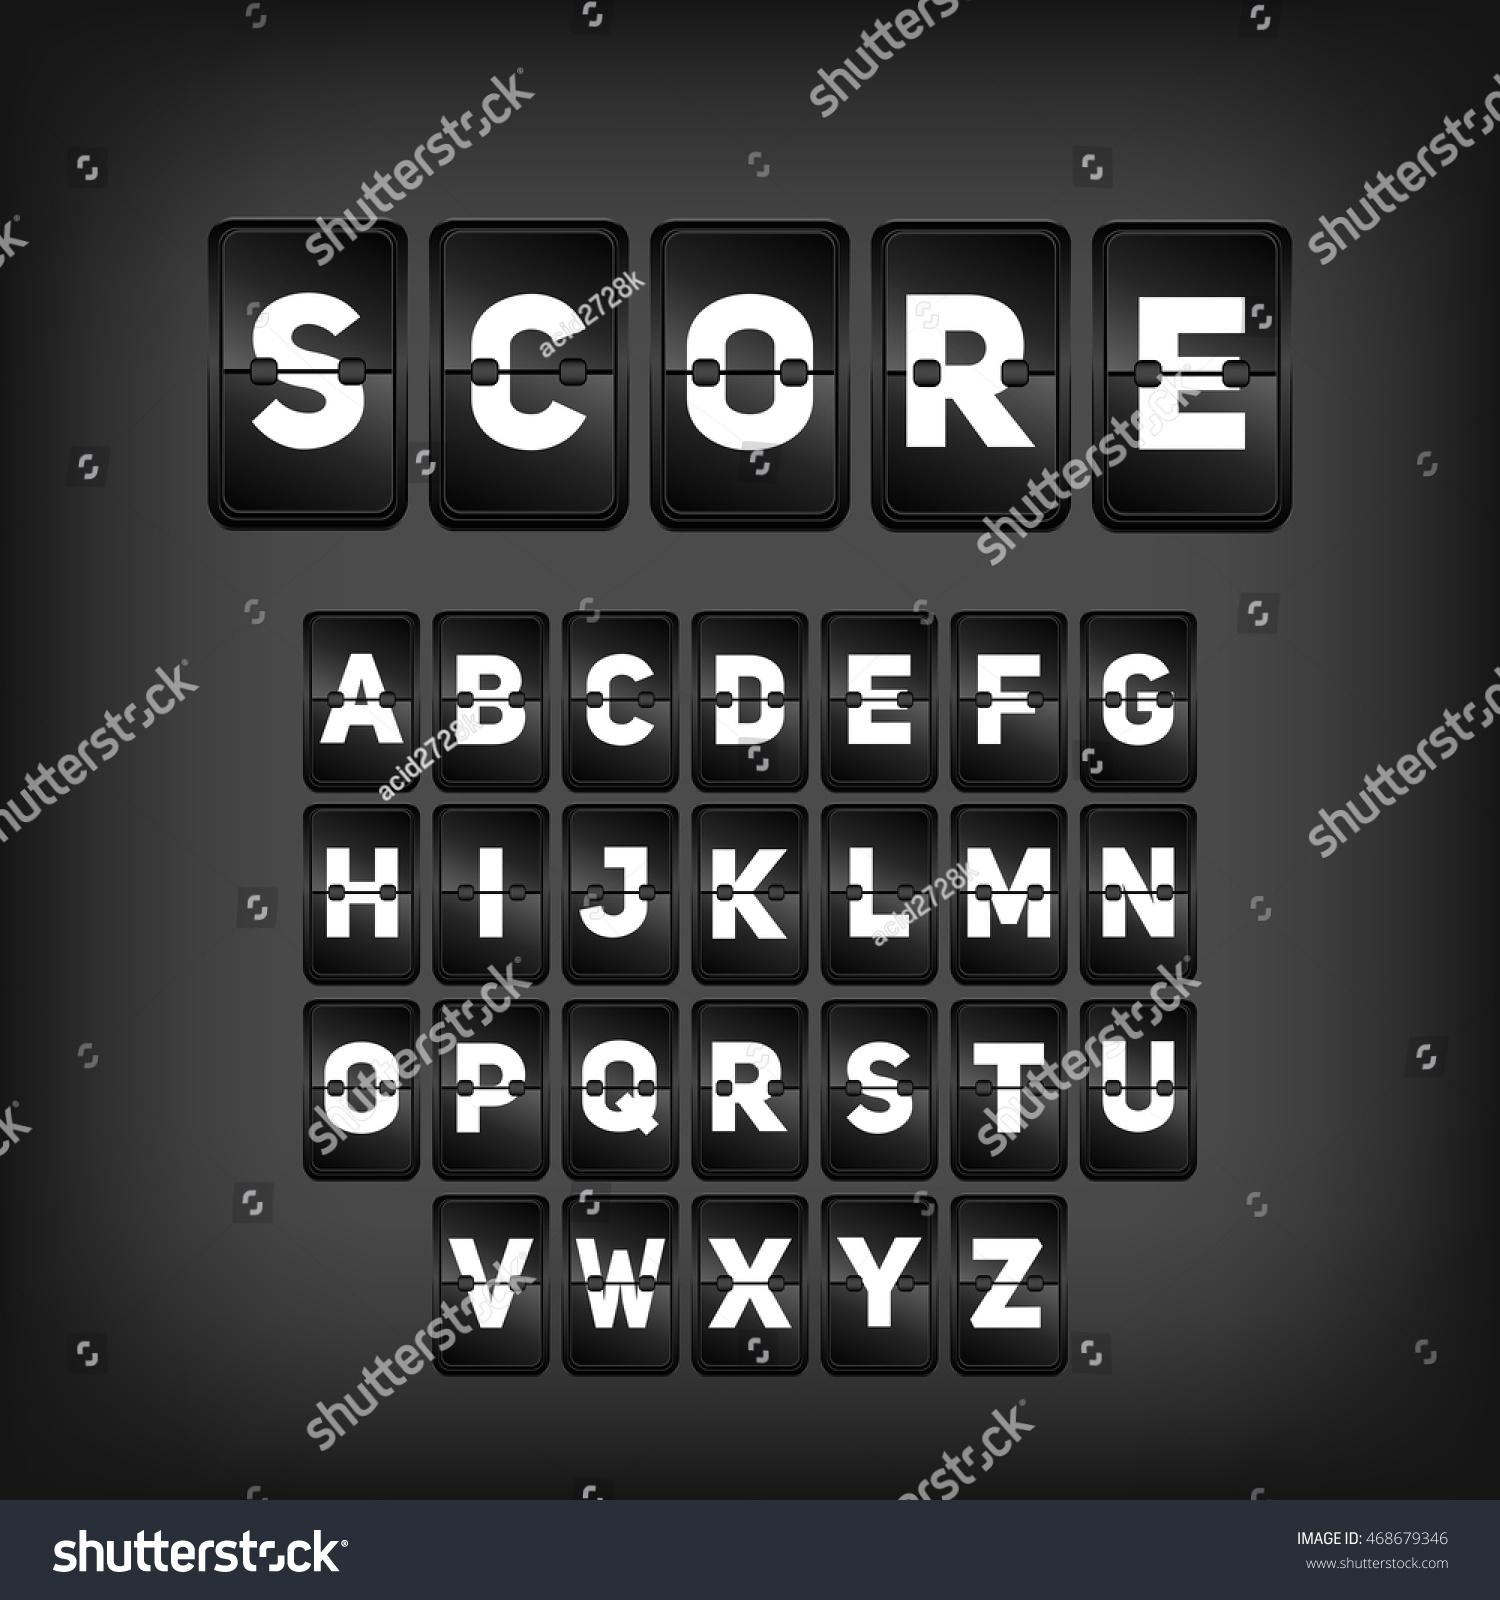 Score Abc Football Soccer Scoreboard Sport Stock Vector Royalty